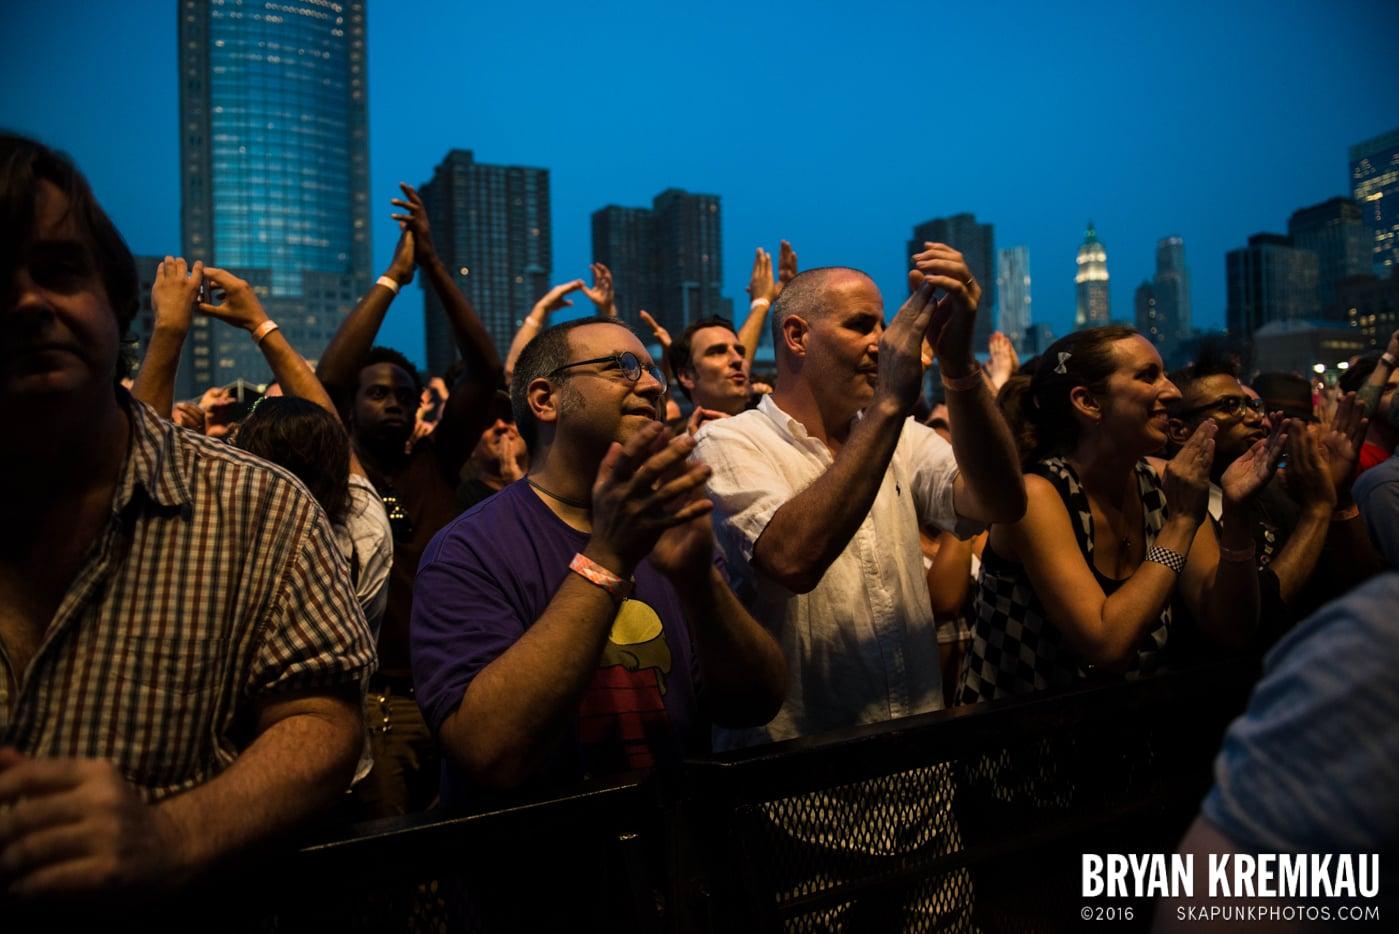 The Specials @ Pier 26, Hudson River Park, NYC (7)